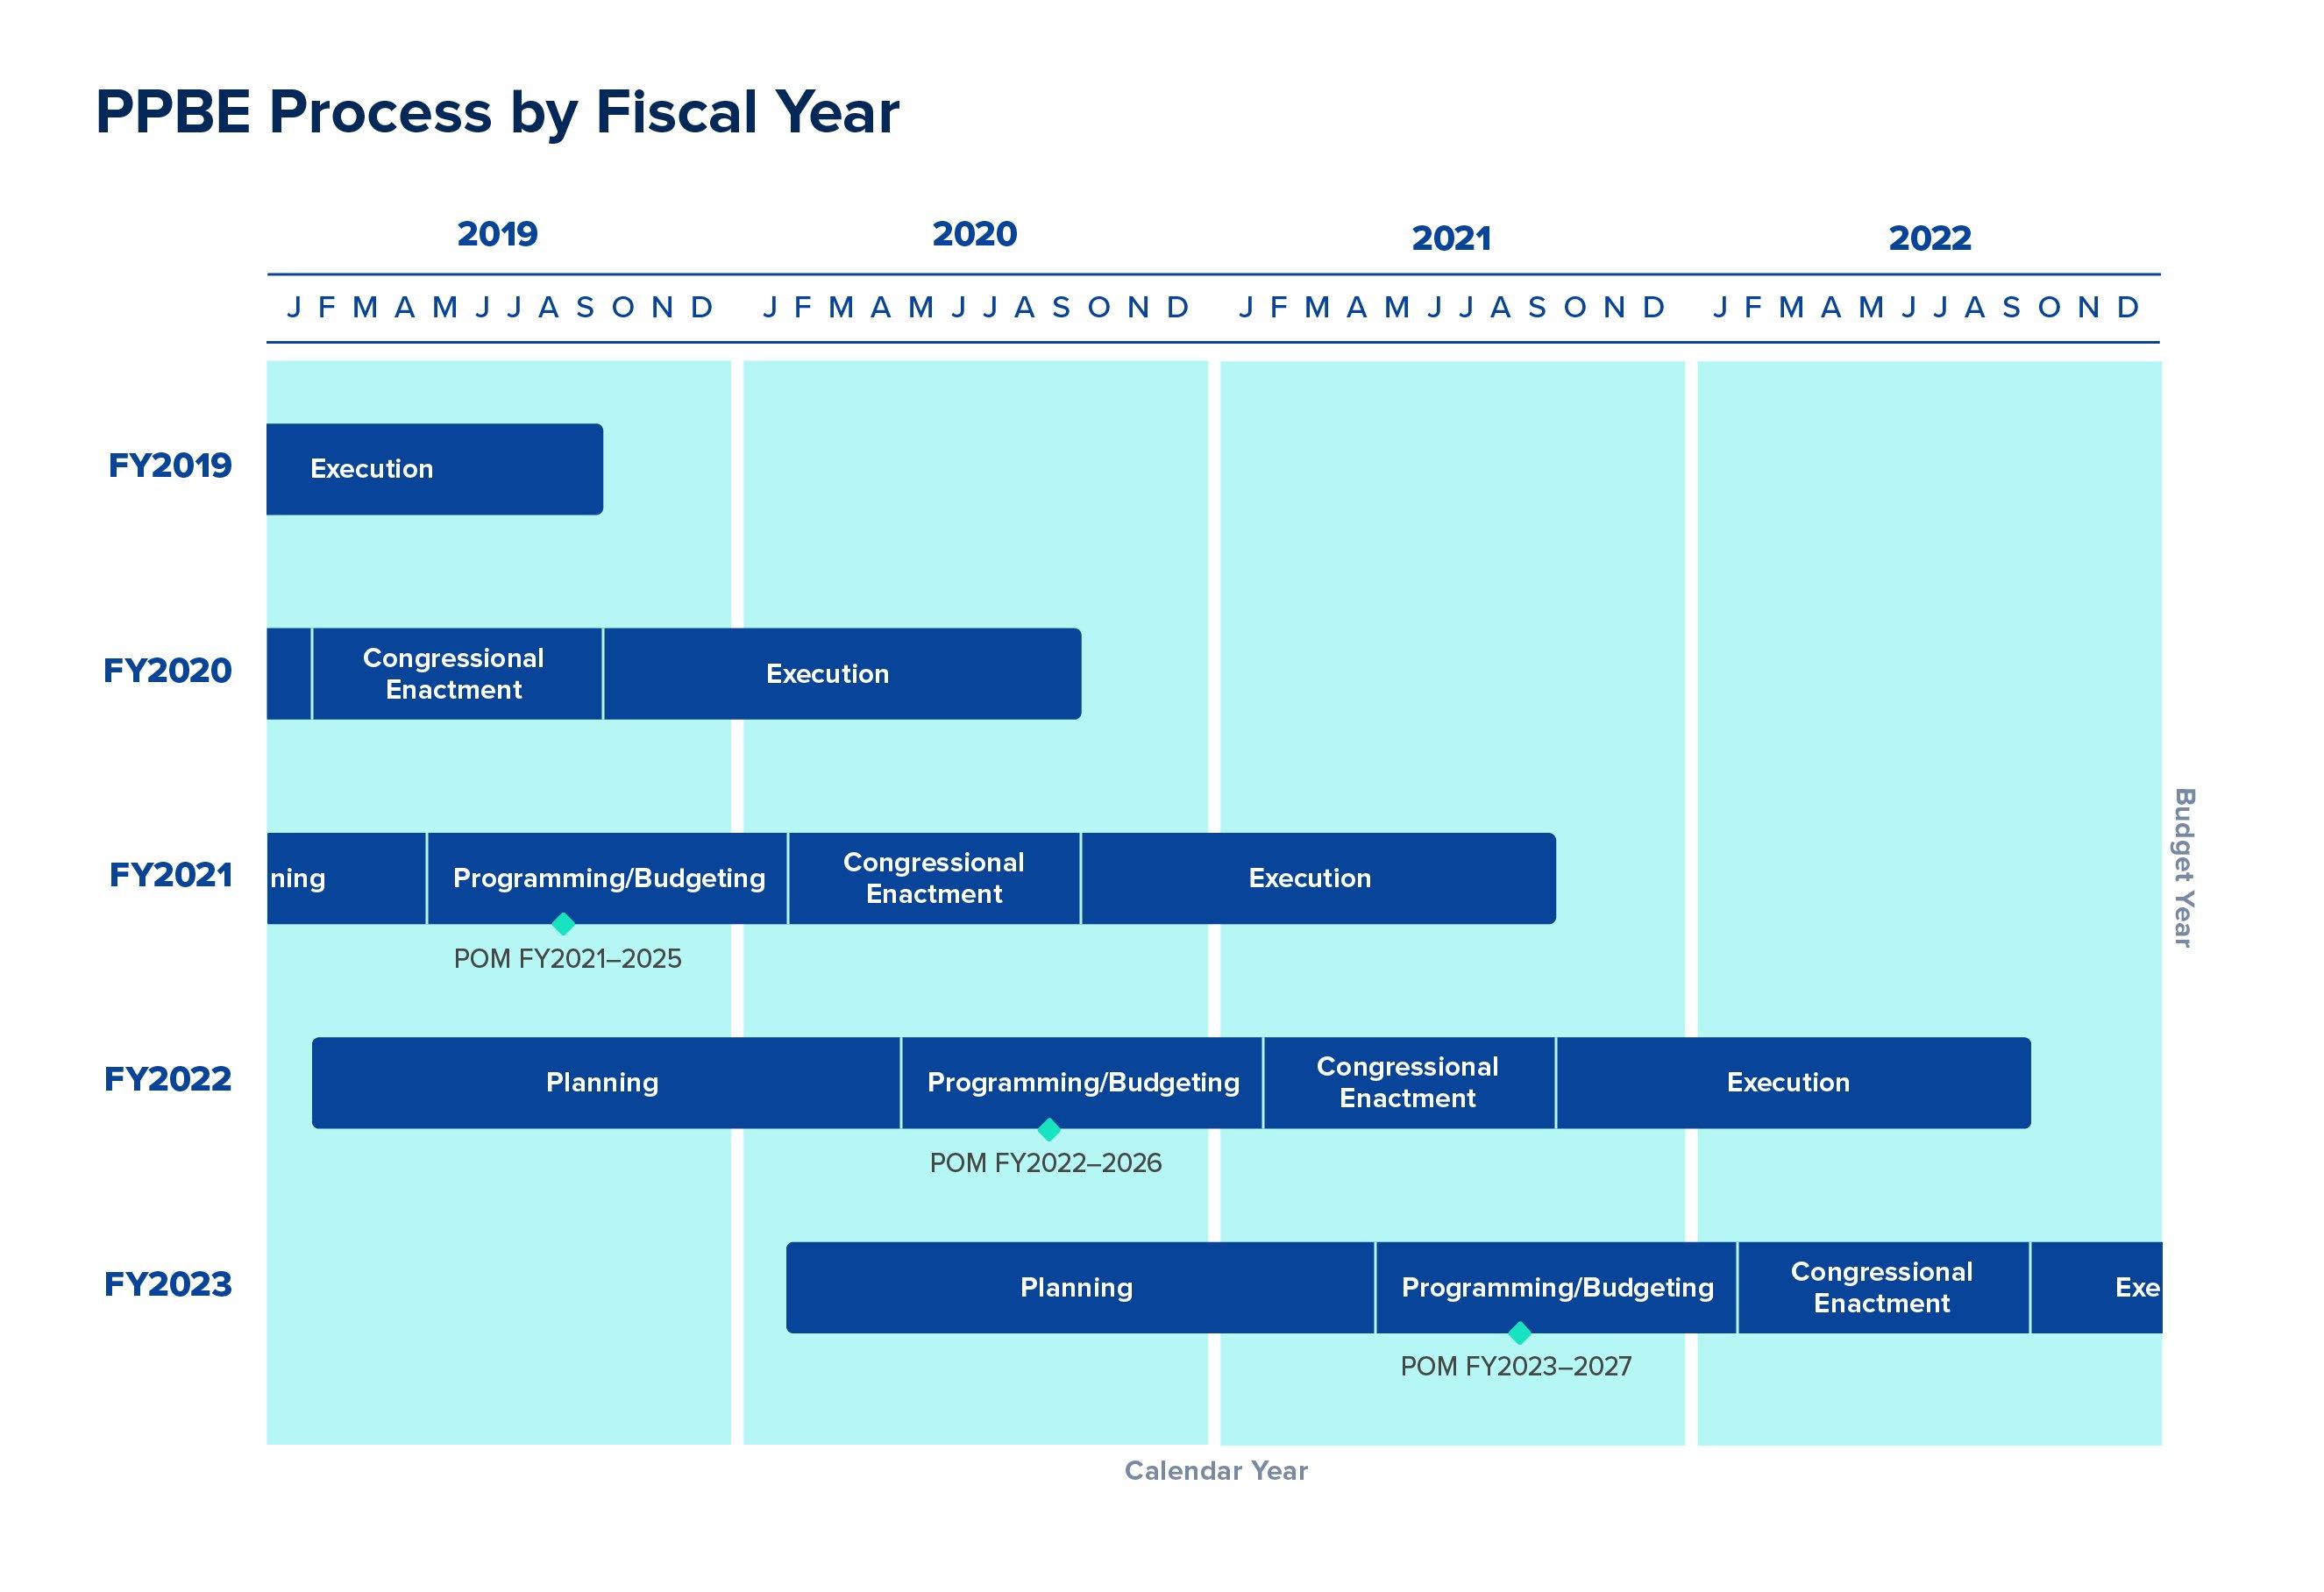 PPBE Process Timeline